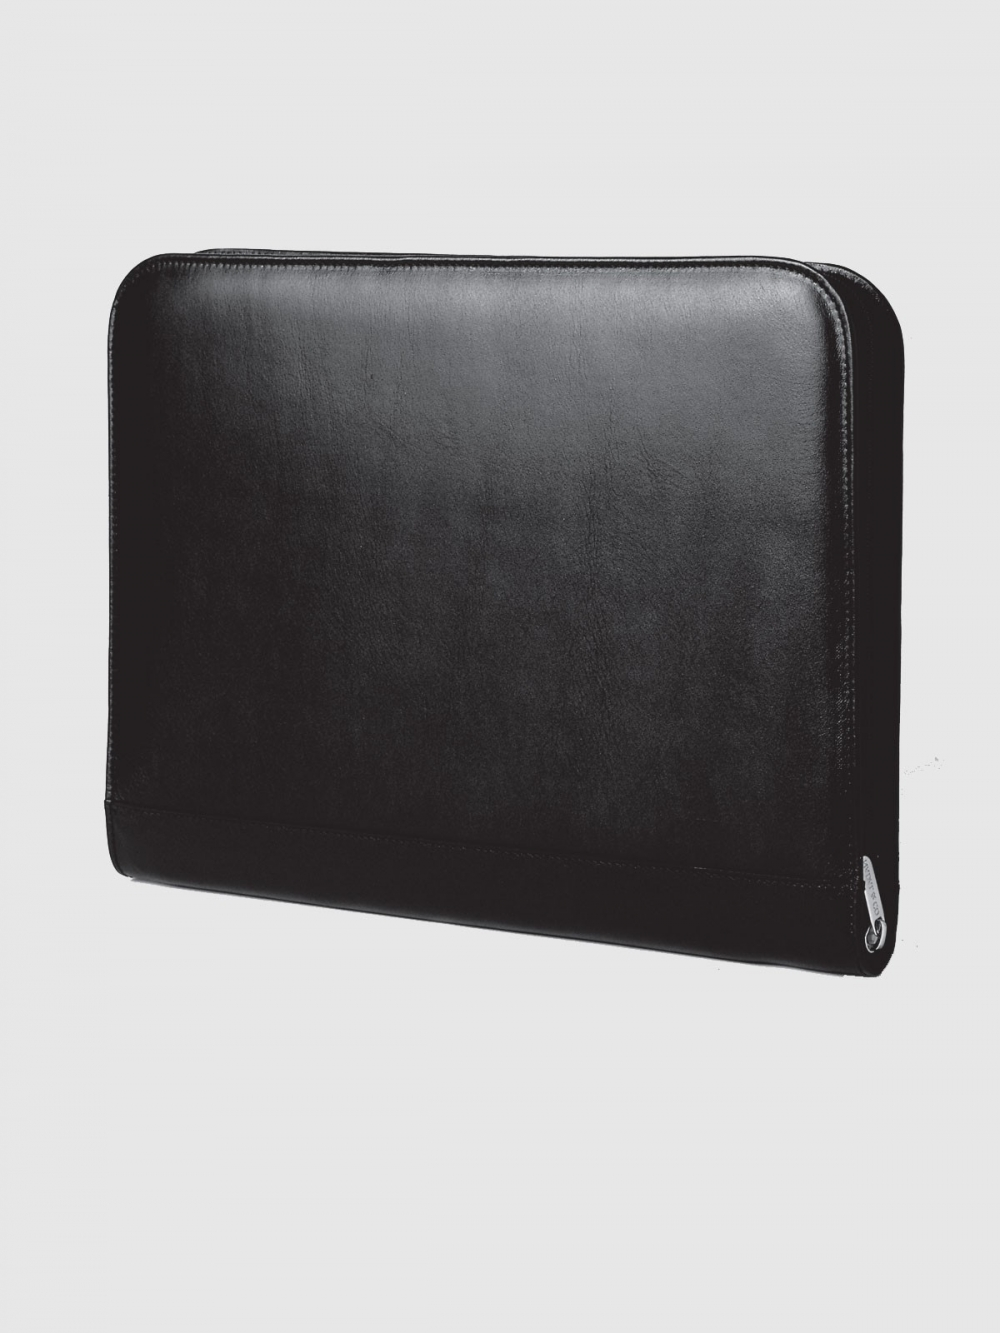 Zipped portfolio